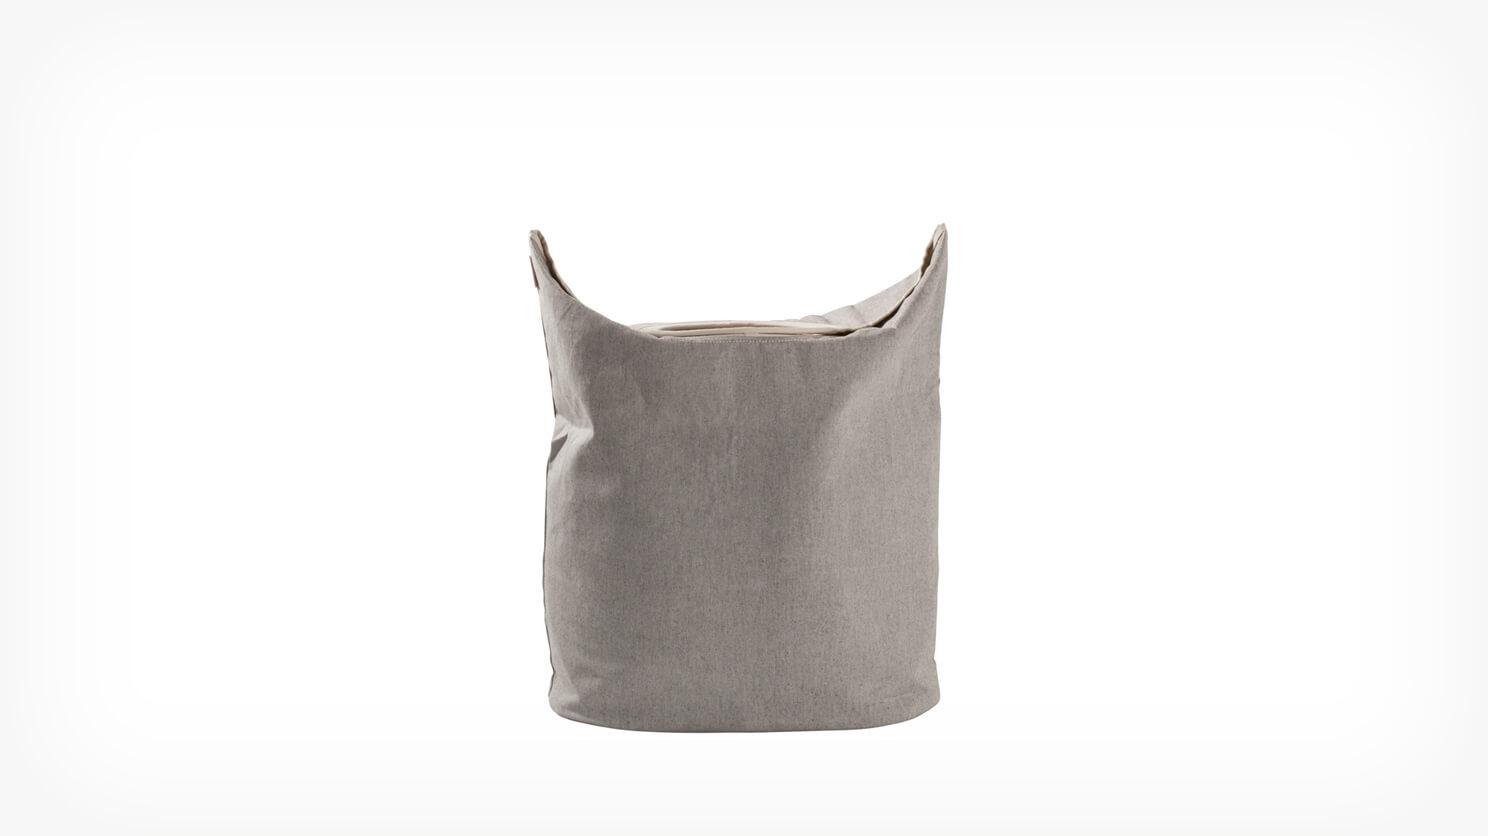 Truss Laundry Hamper Light Grey Eq3